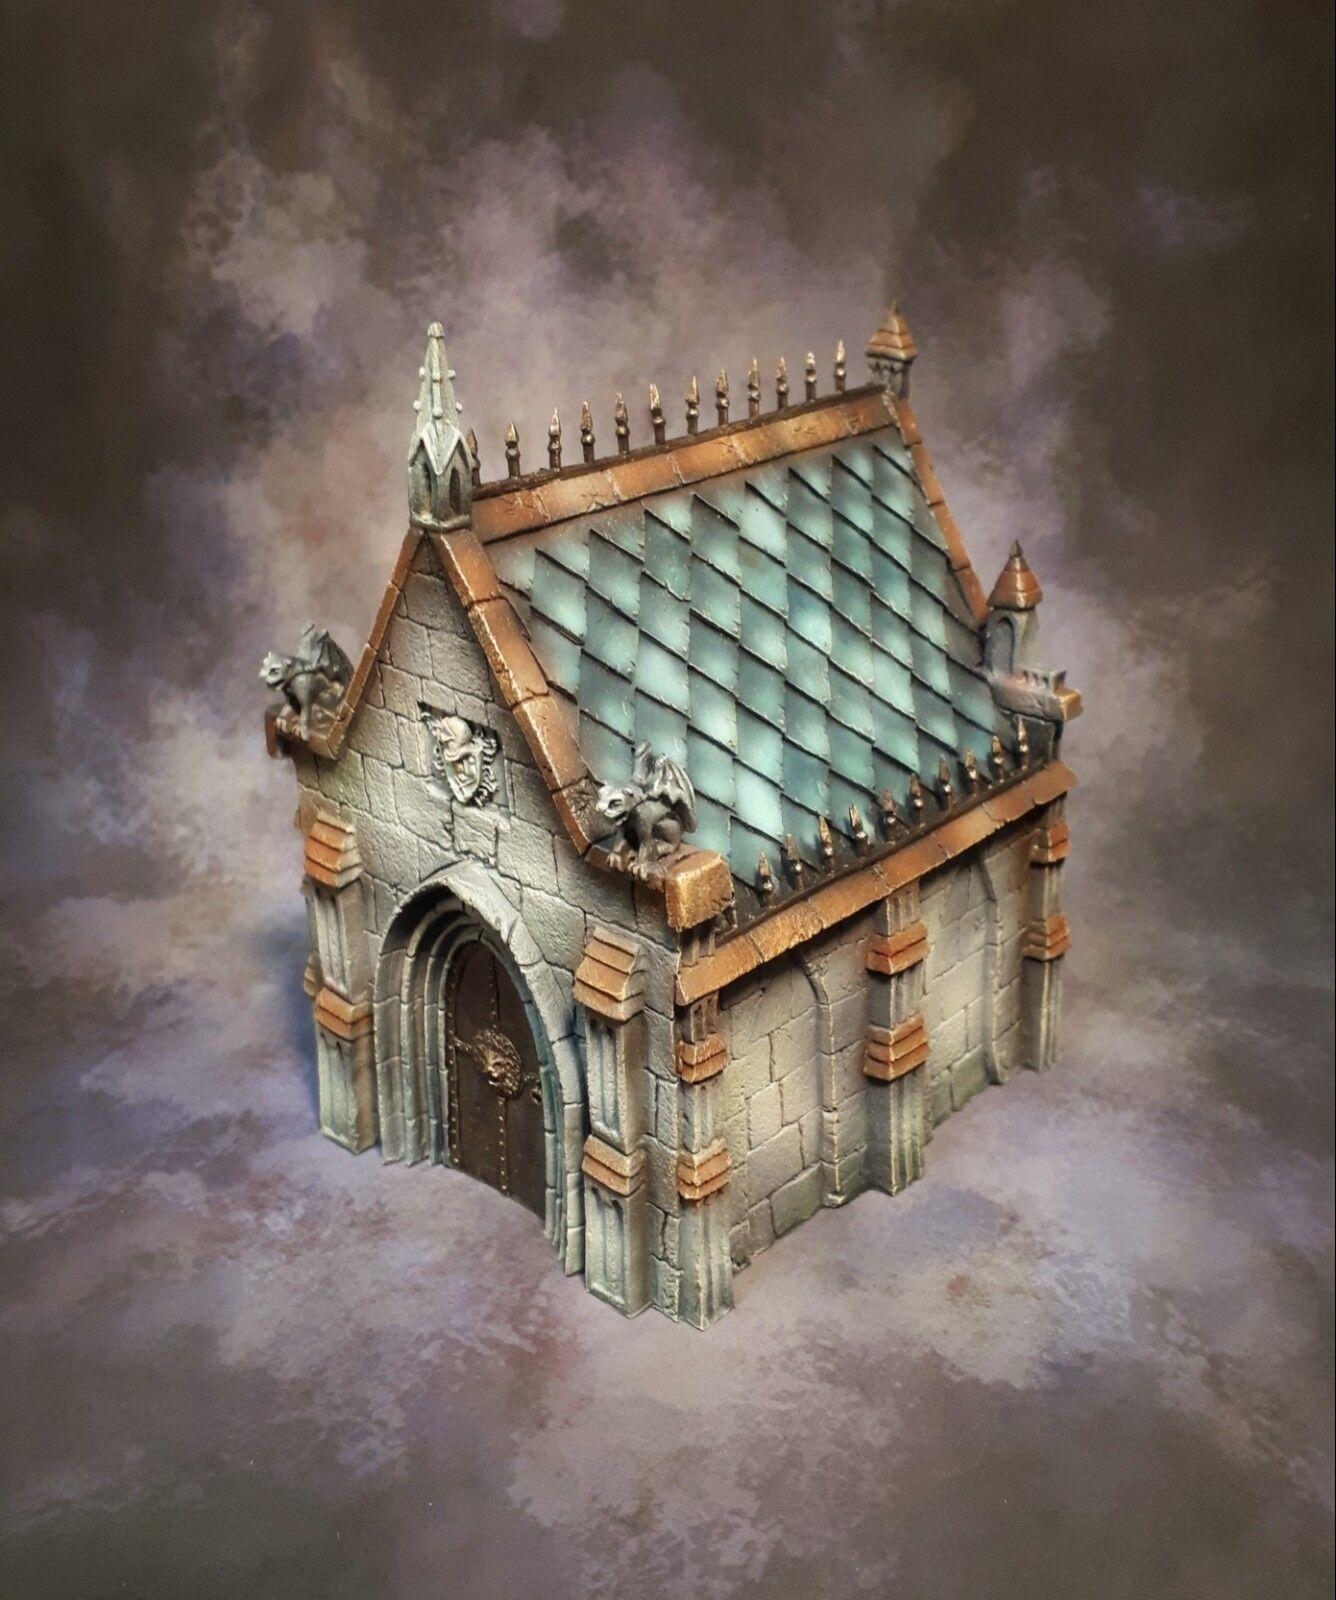 Tabletop World - Mausoleum - Pro-Painted